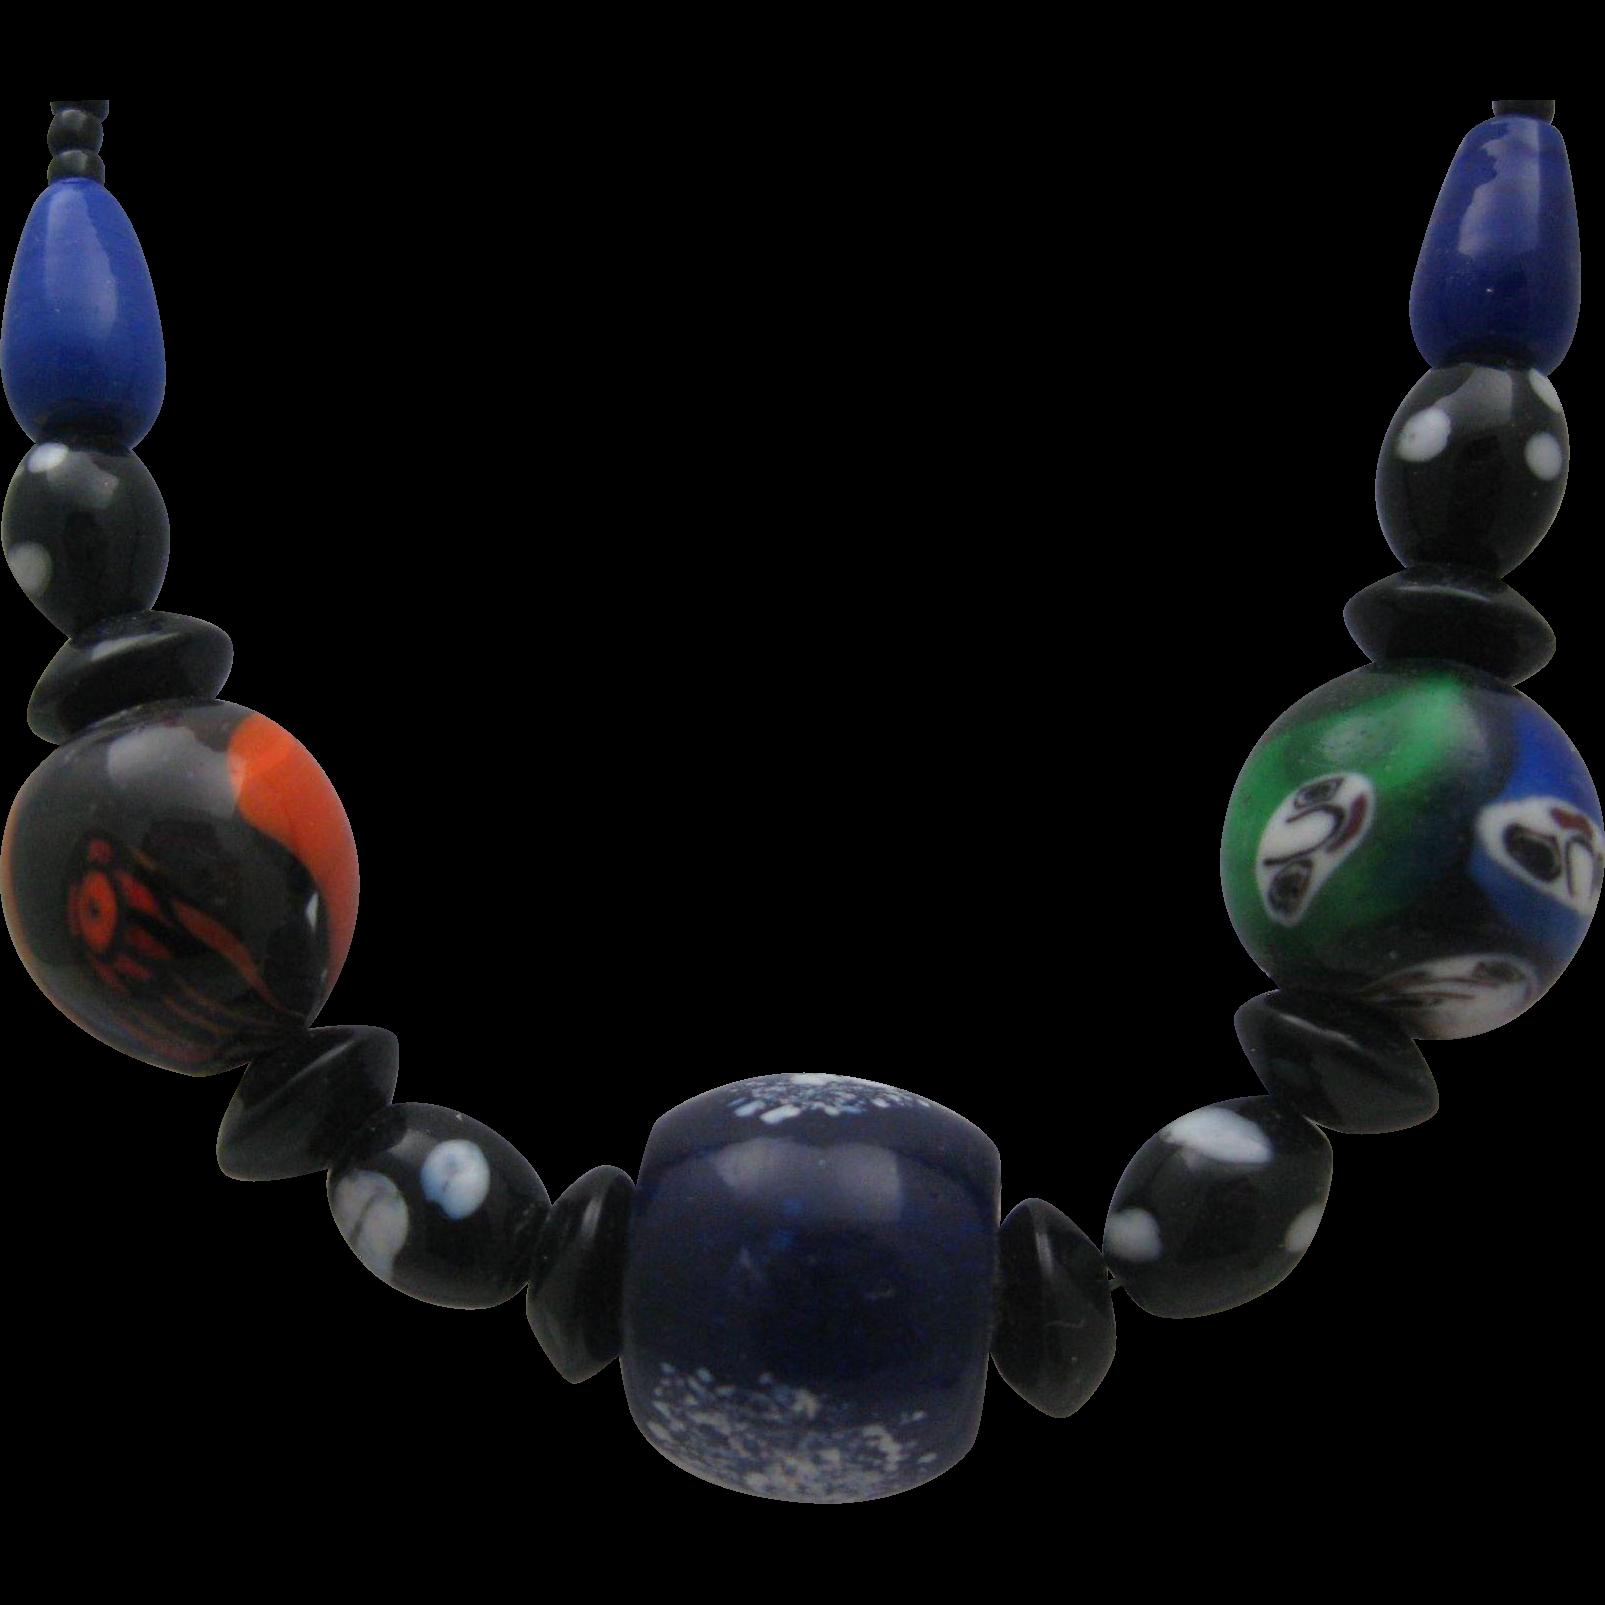 Italian Art Deco Millefiori Glass Necklace Choker style